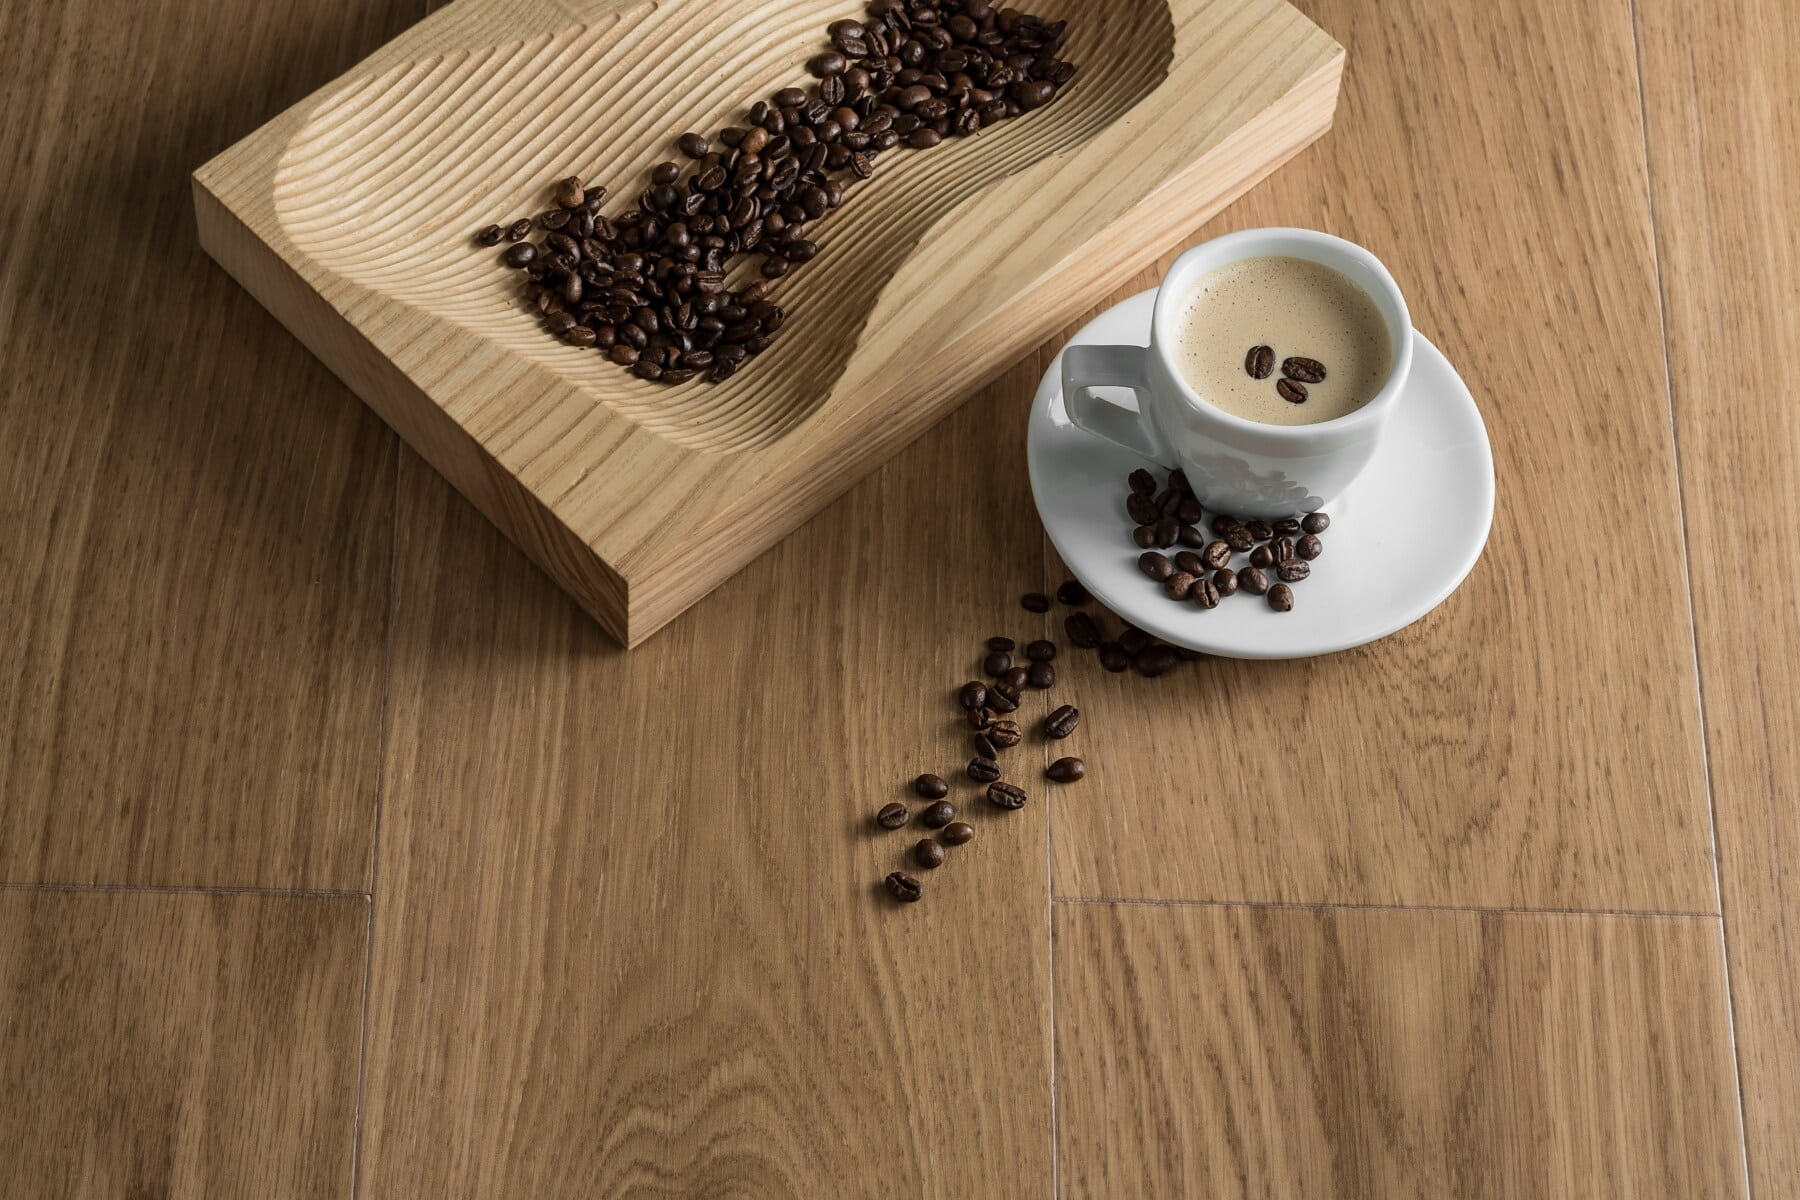 cafeína, capuchino, calentar, taza de café, café, semilla, caliente, desayuno, bebidas, bebida